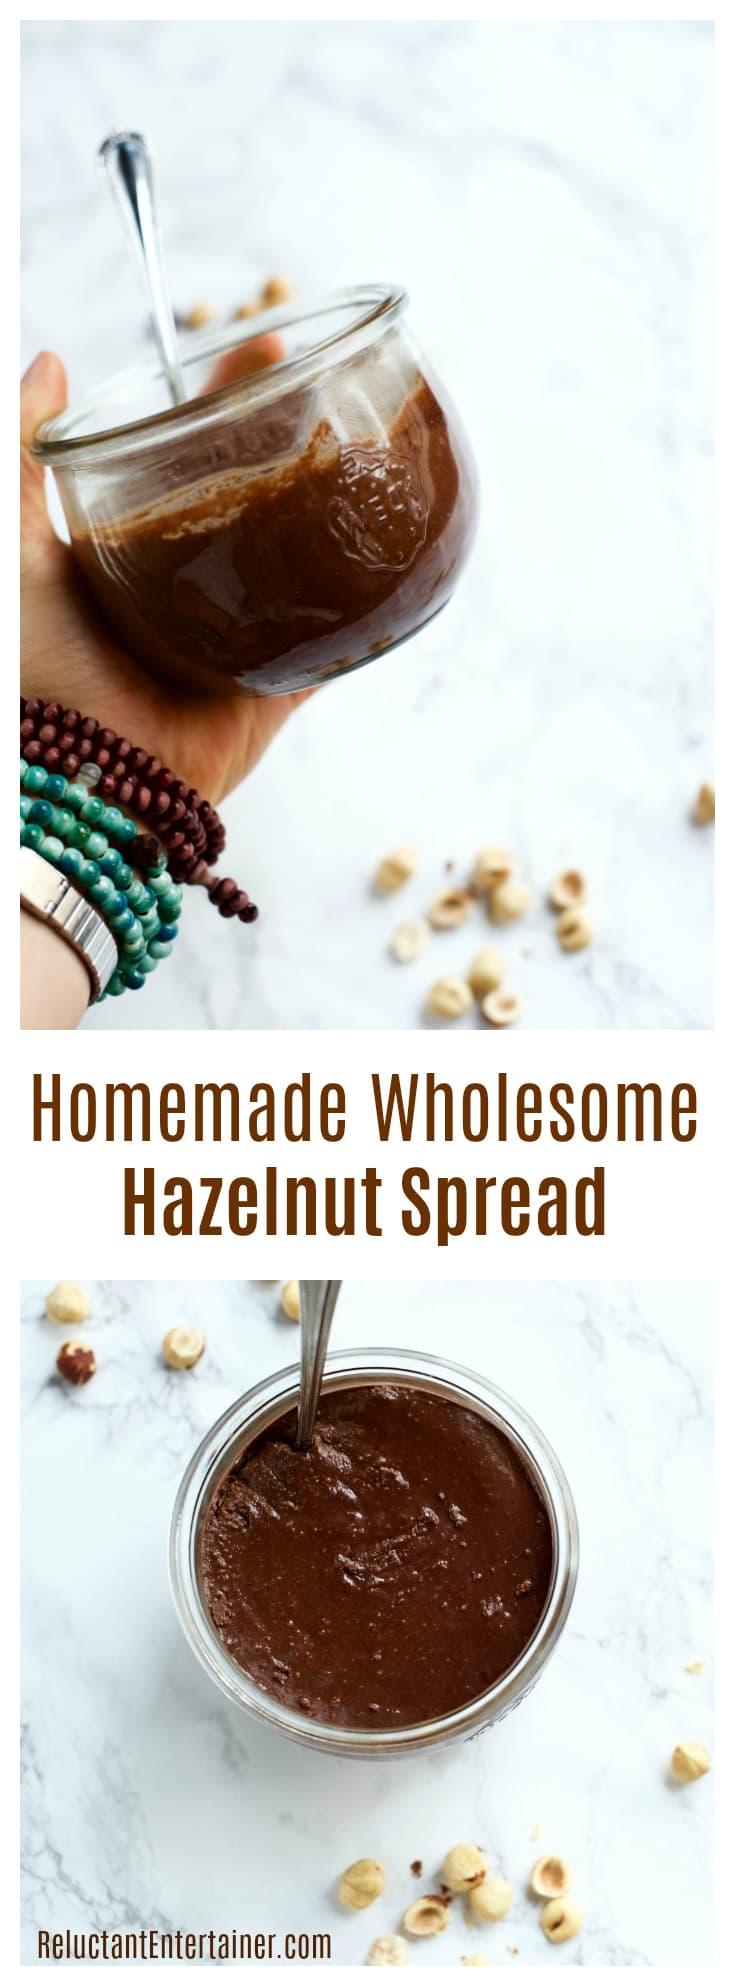 Homemade Wholesome Hazelnut Spread